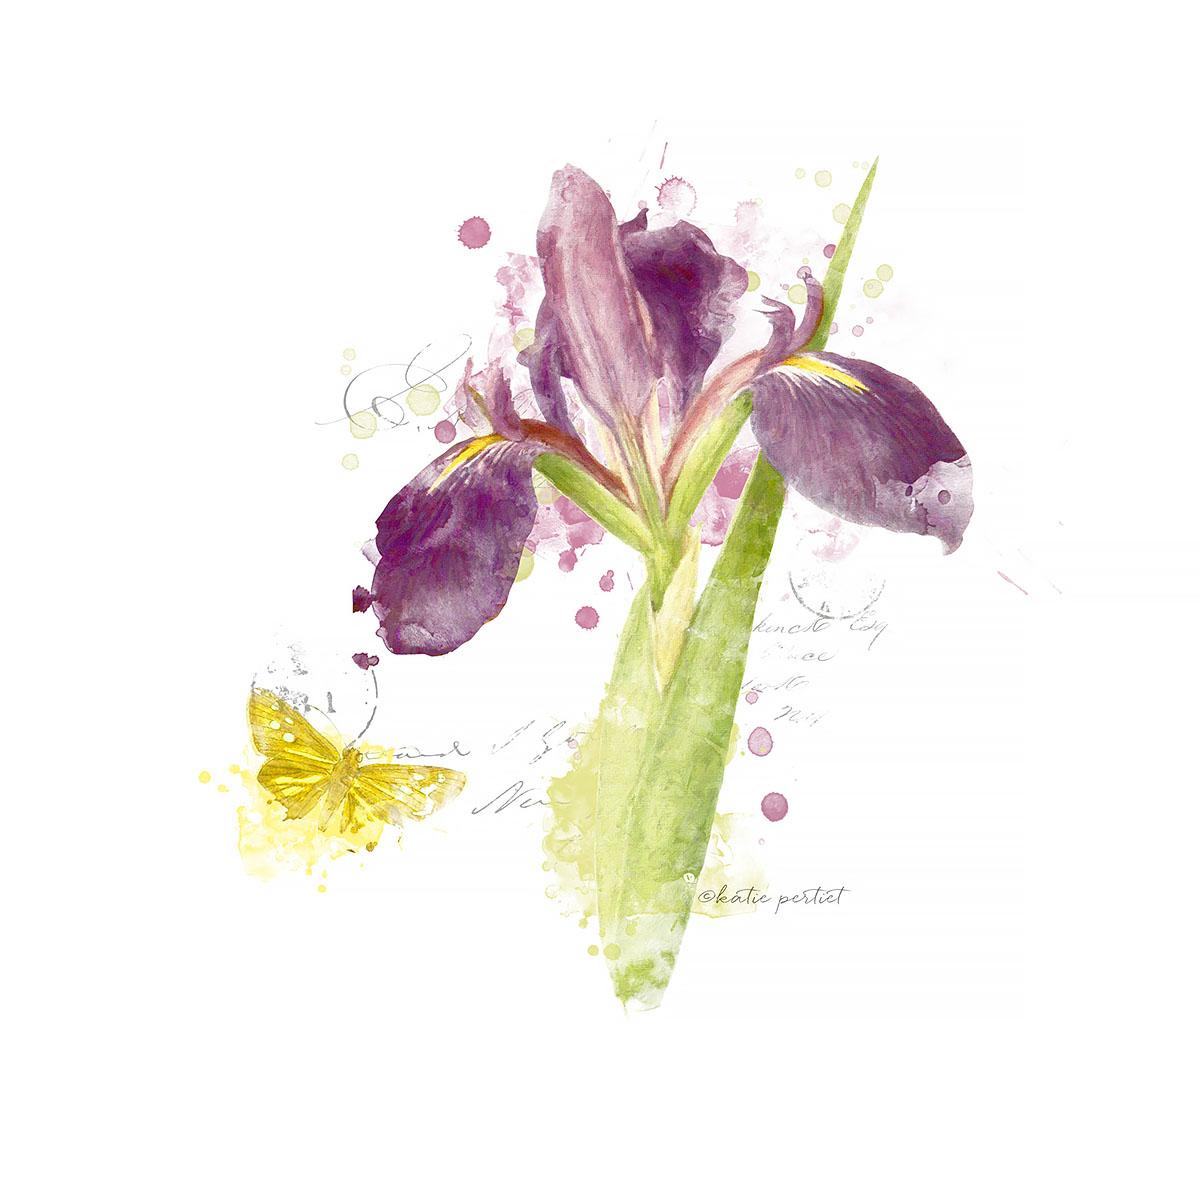 Katie pertiet Watercolor Botanical